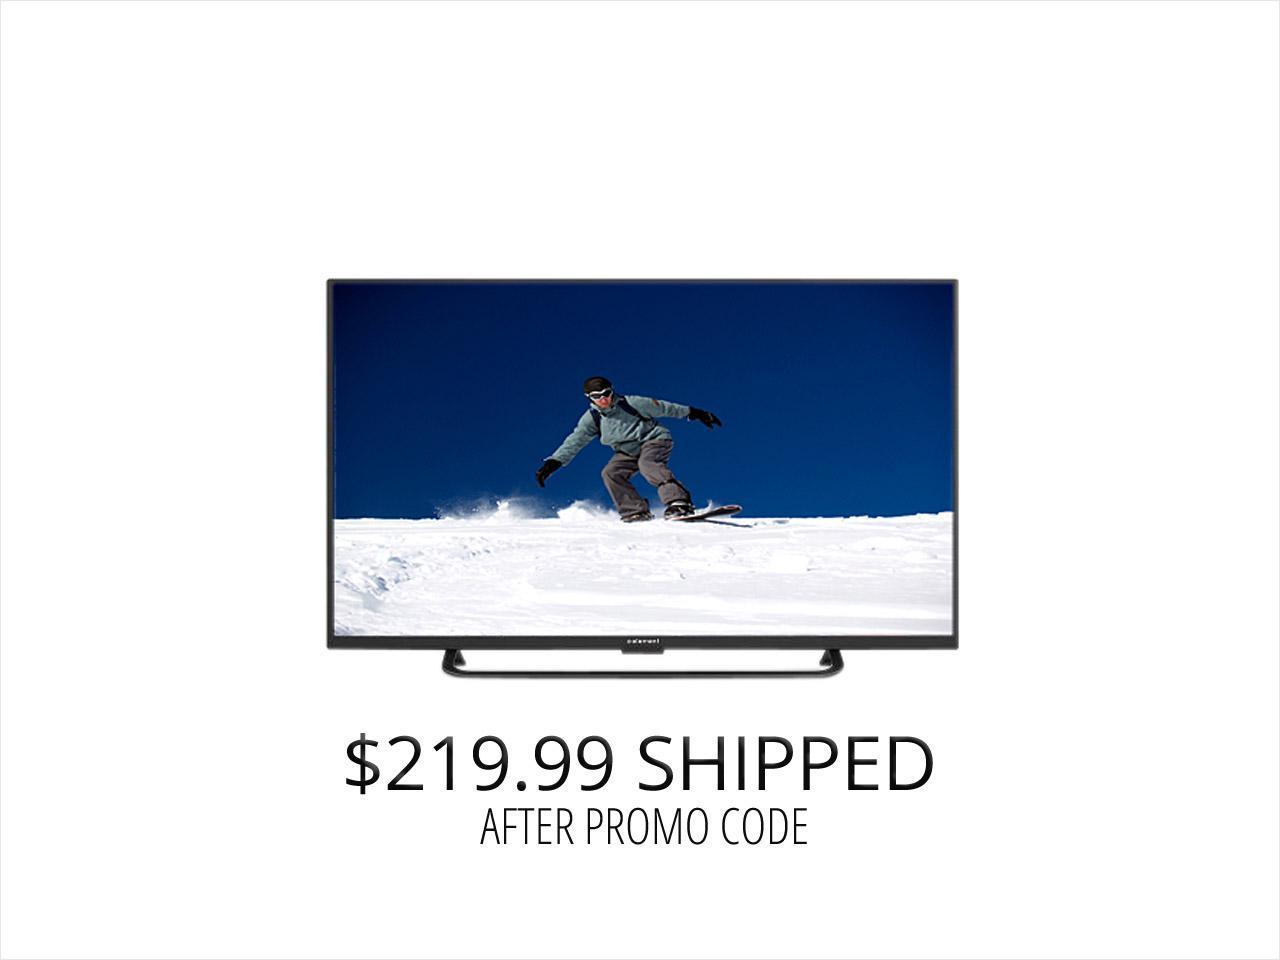 "Refurbished: ELEMENT 50"" 1080p 120Hz LED TV, Double Box"